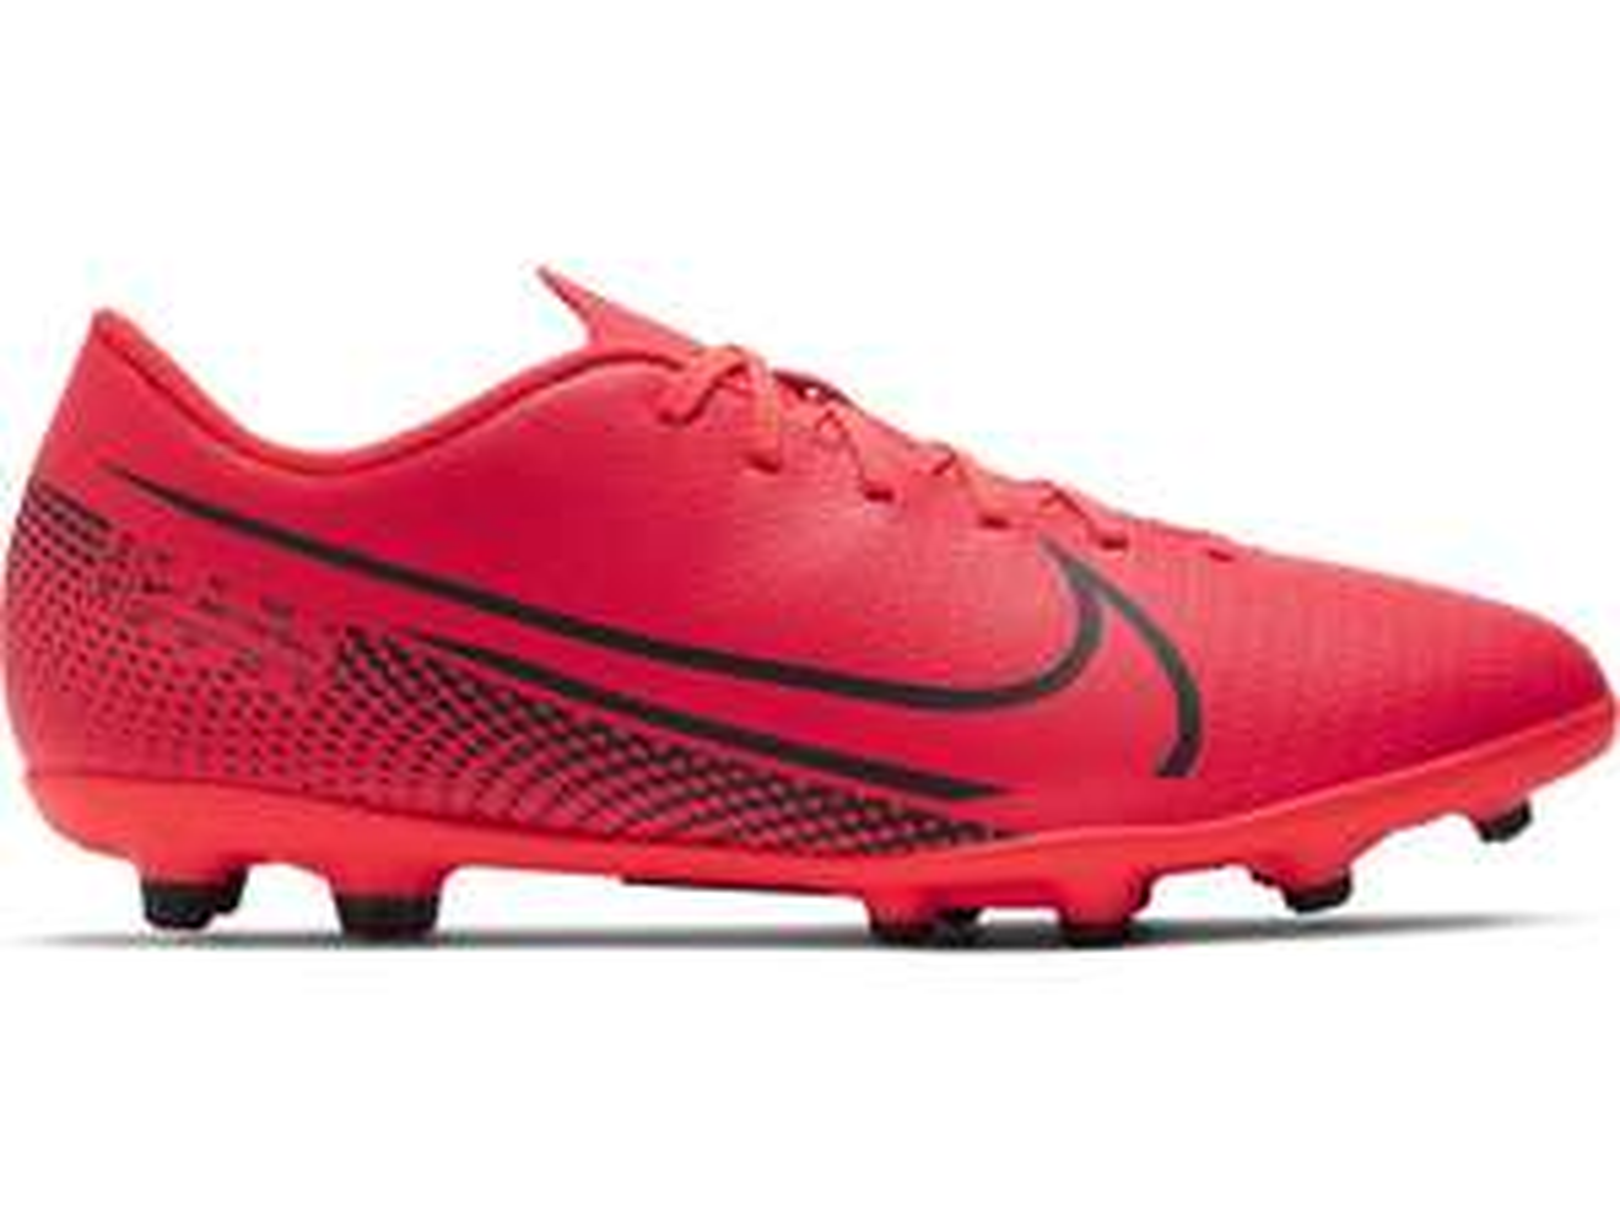 Liverpool; Tenis Nike Mercurial Vapor 13 Club MG fútbol